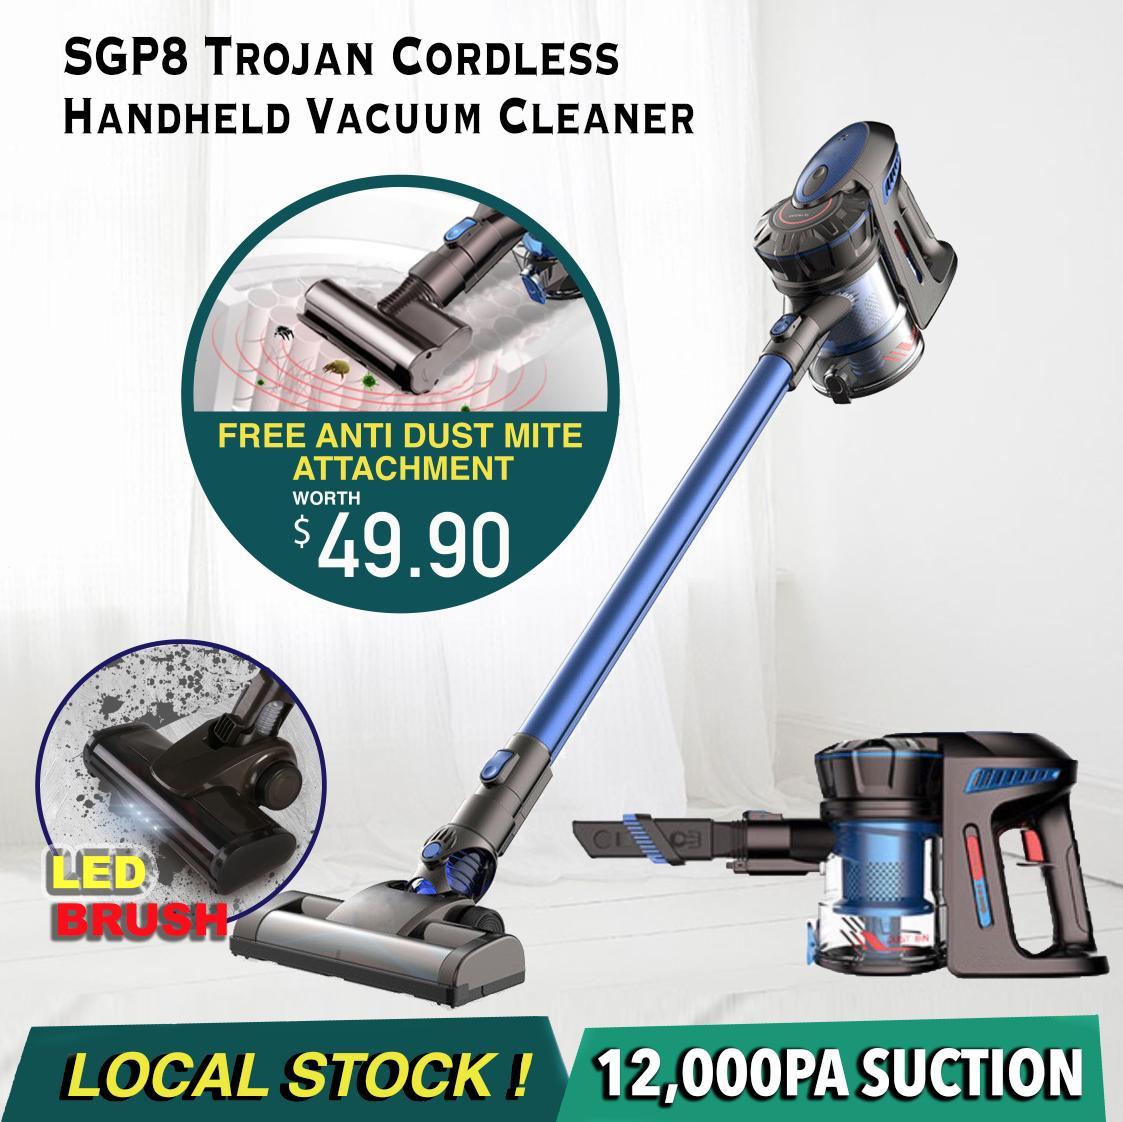 Minihelpers SGP8 Trojan Cordless Vacuum Cleaner Portable Car xiaomi Dibea Vacuum Cleaner (12 Months Warranty)